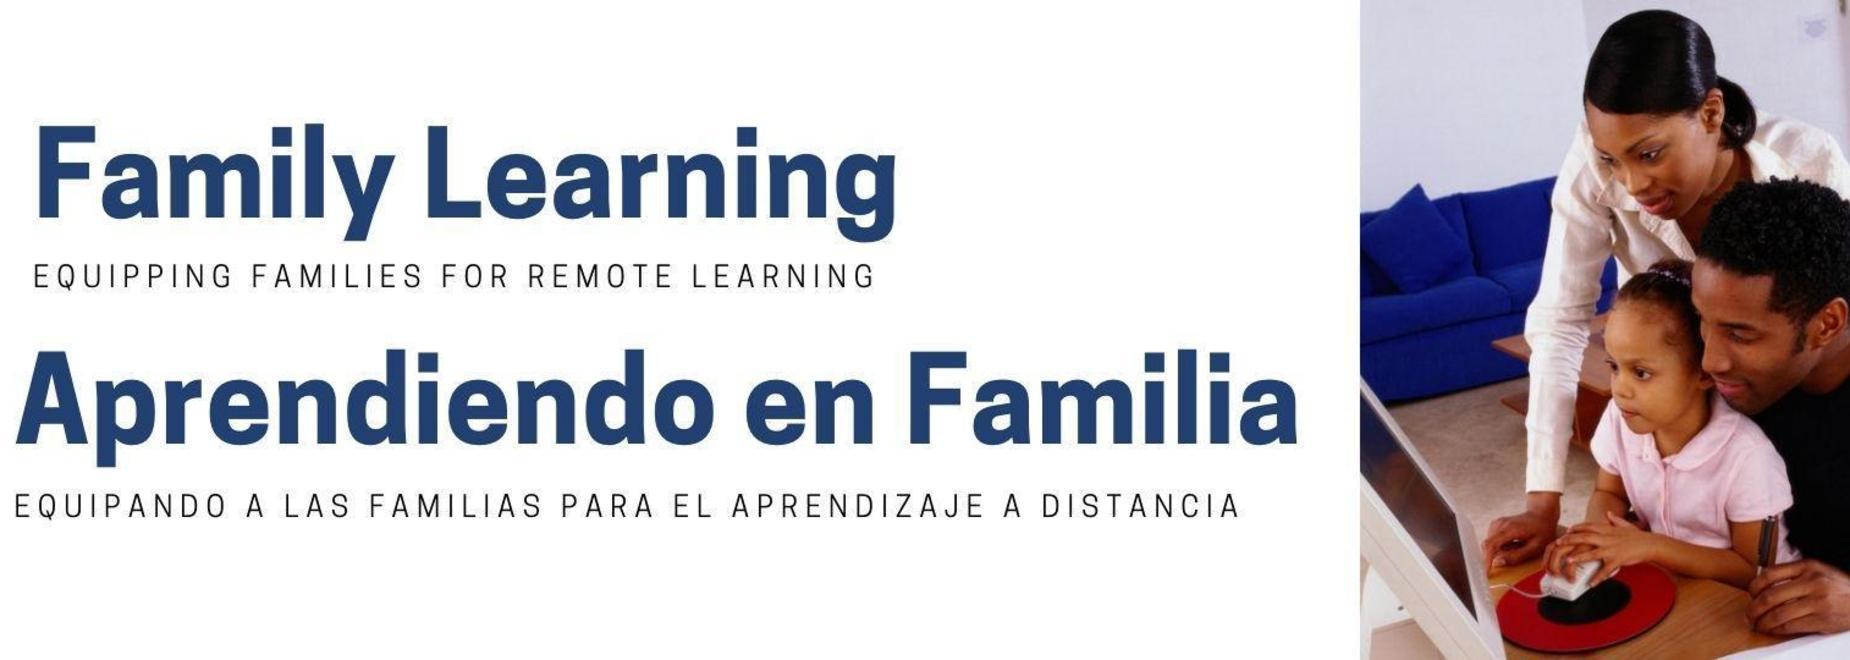 Family learning, equipping families for remote learning. Aprendiendo en familia, equipando a las familias para el aprendizaje a distancia